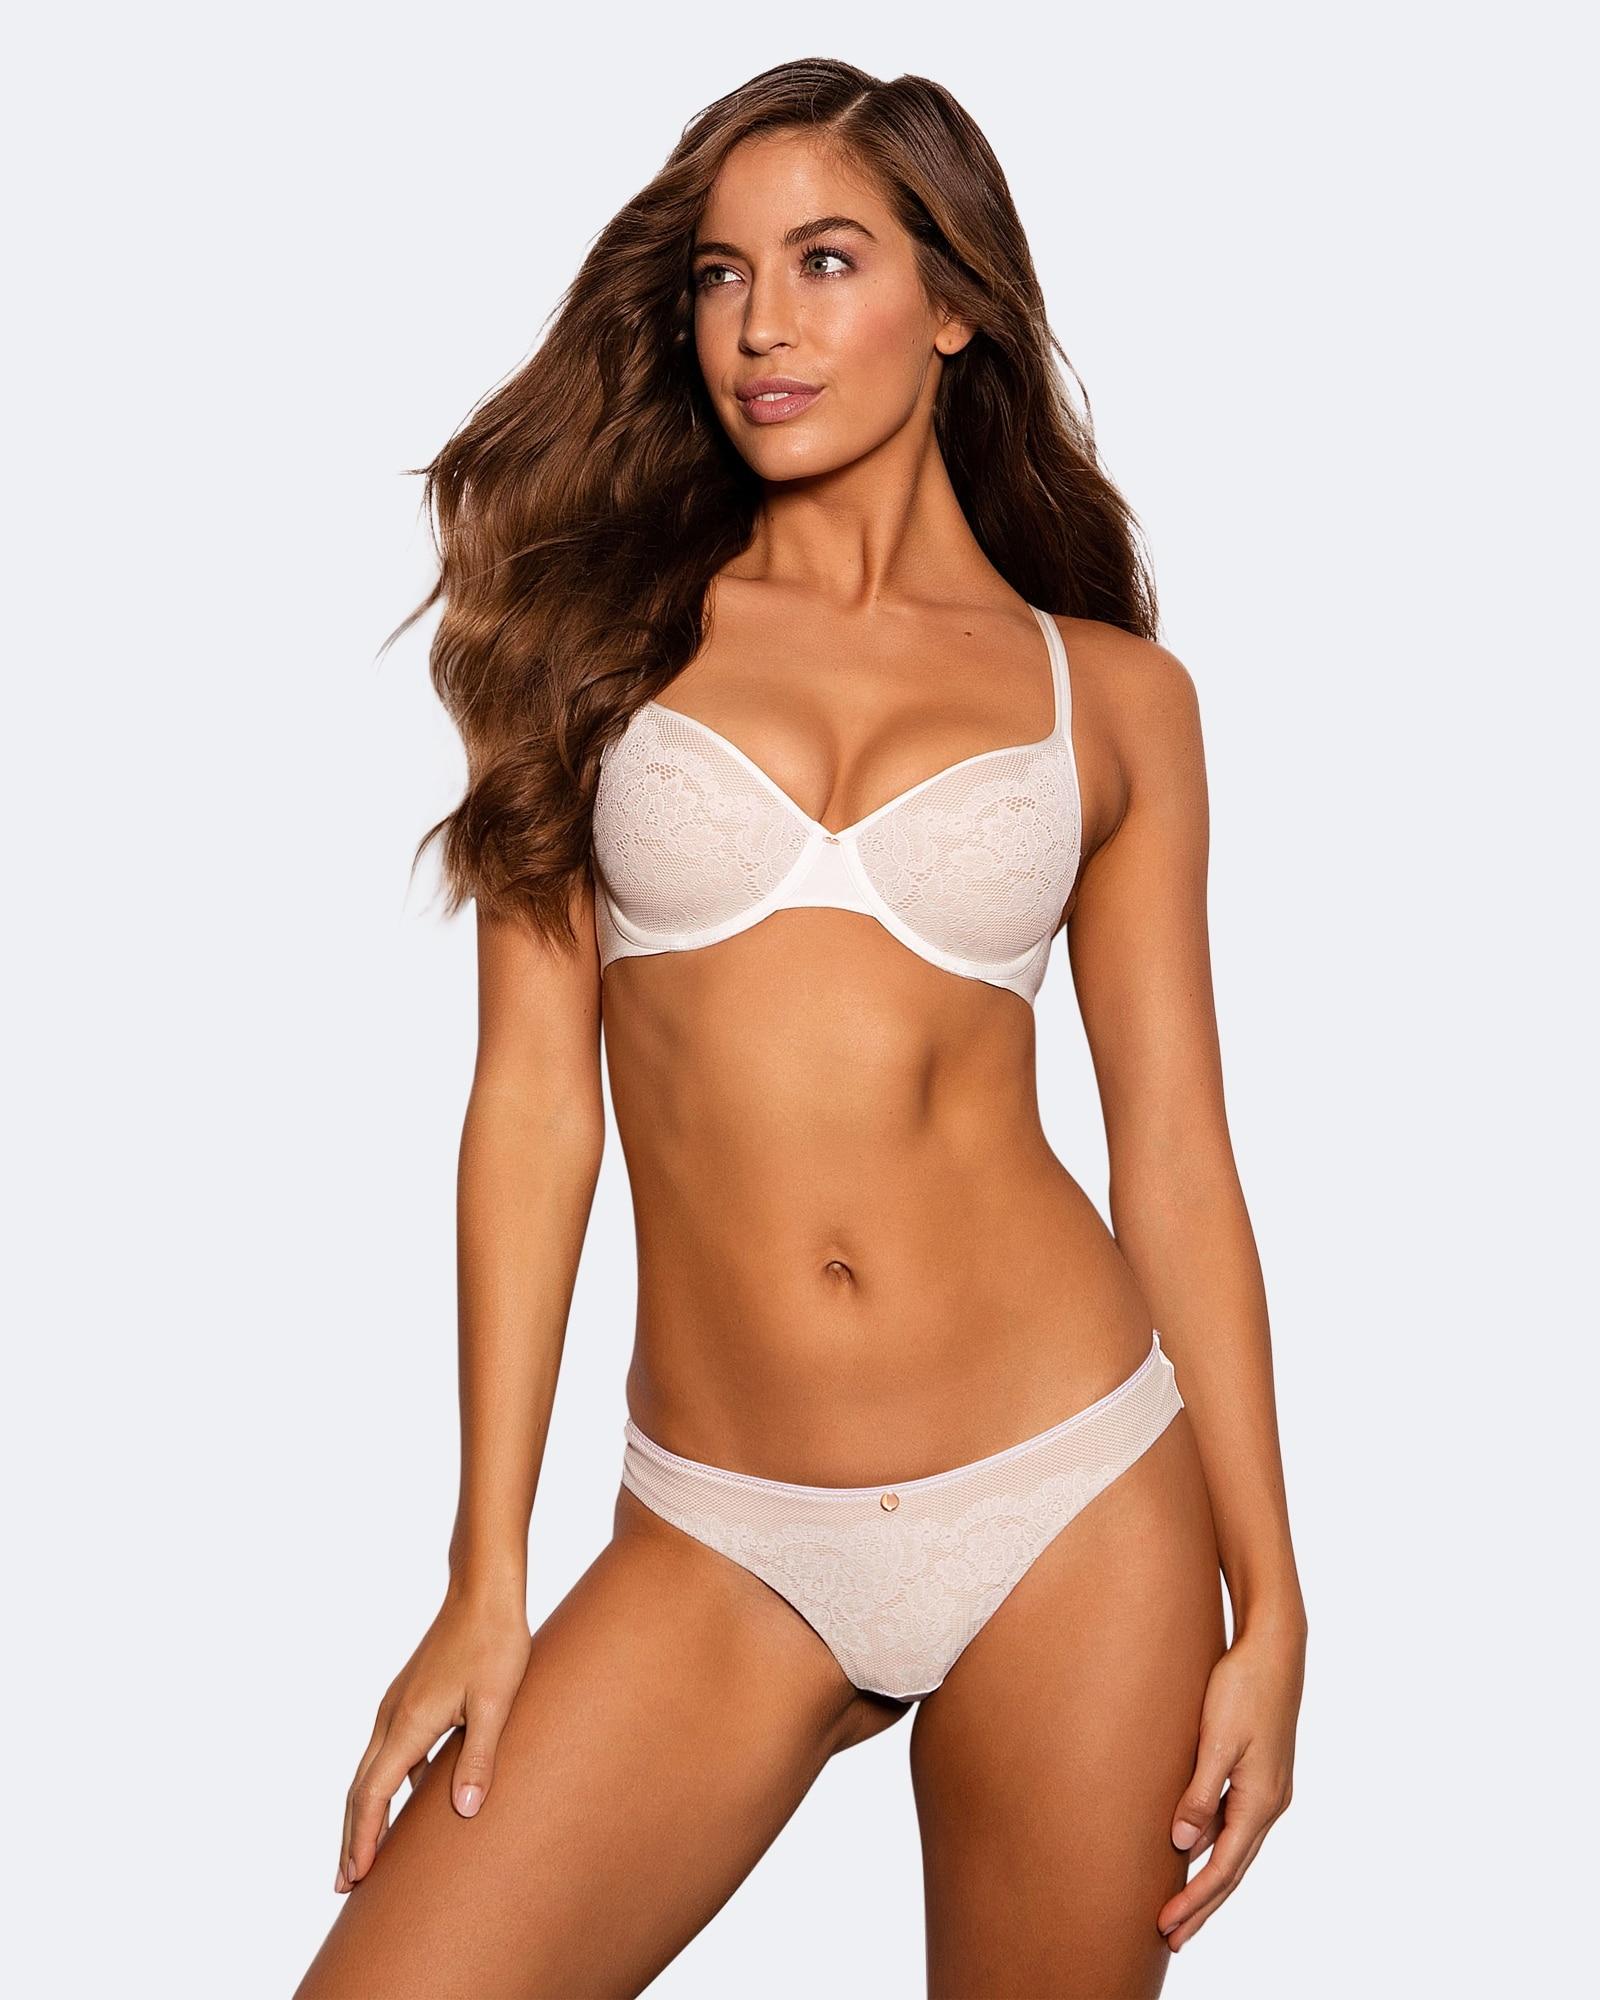 Pure Body Lace Contour Bra - Ivory